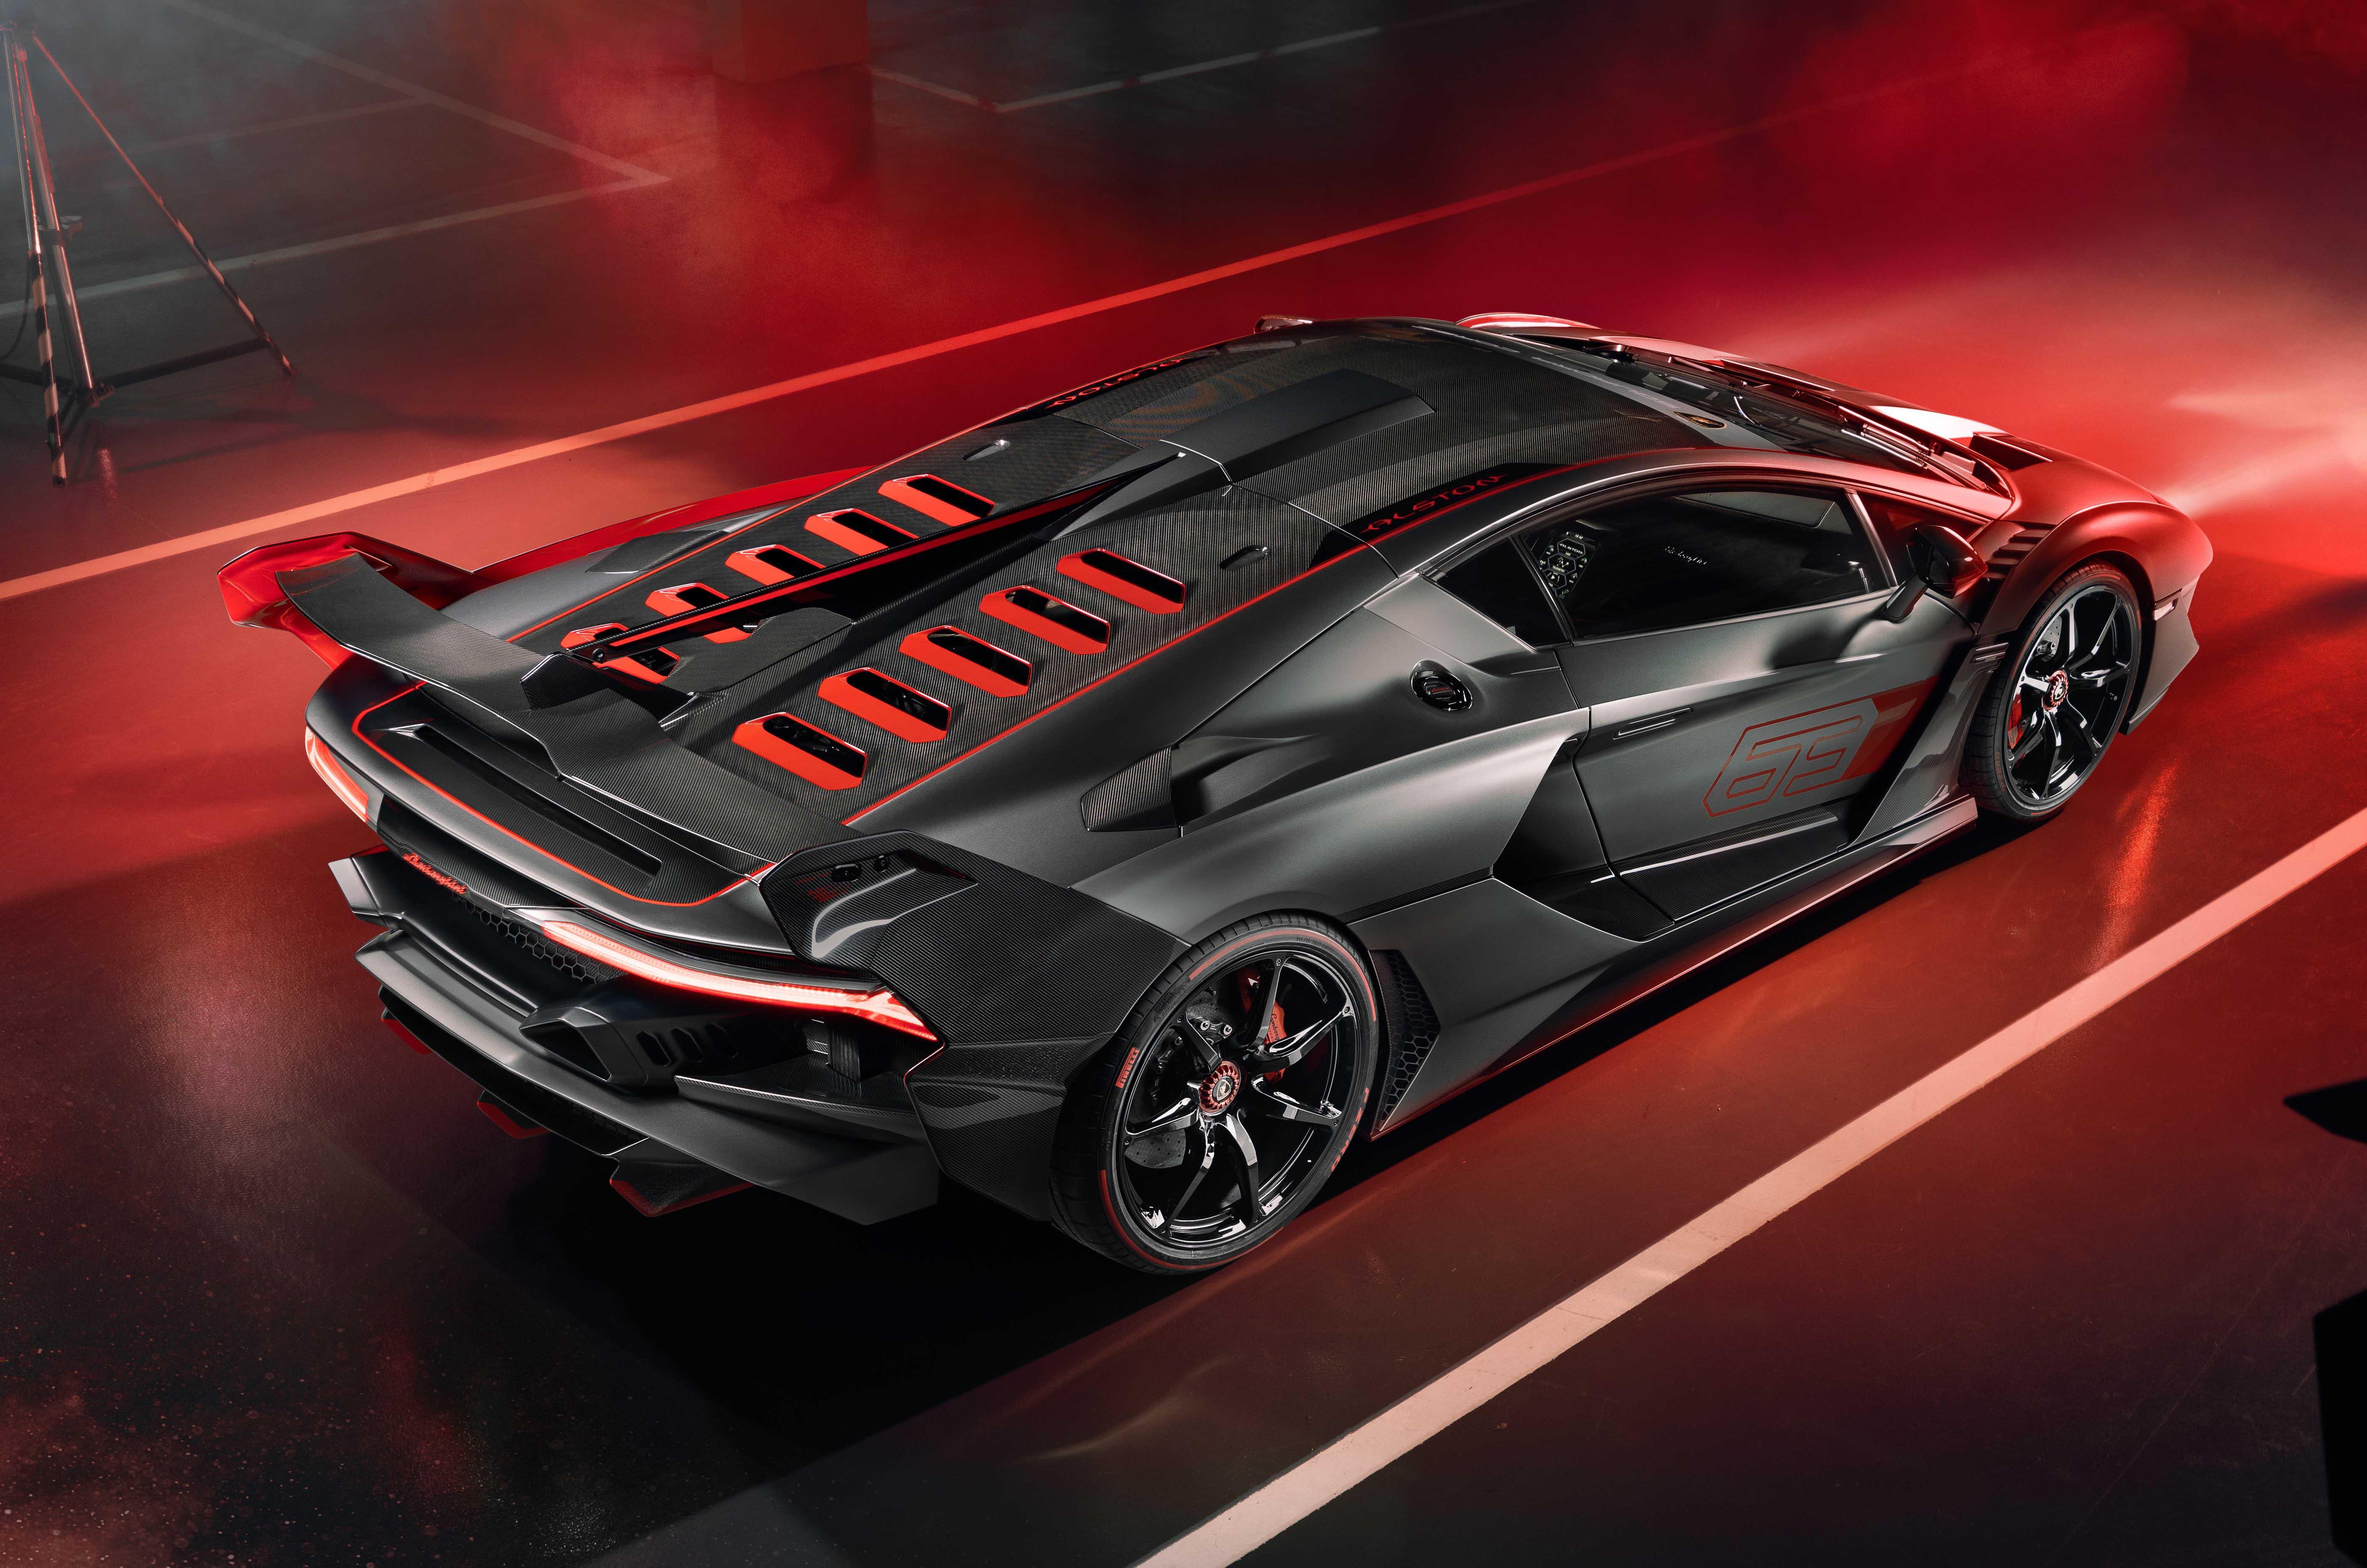 Lamborghini Sc18 Is Maker S First One Off Race Car Autocar